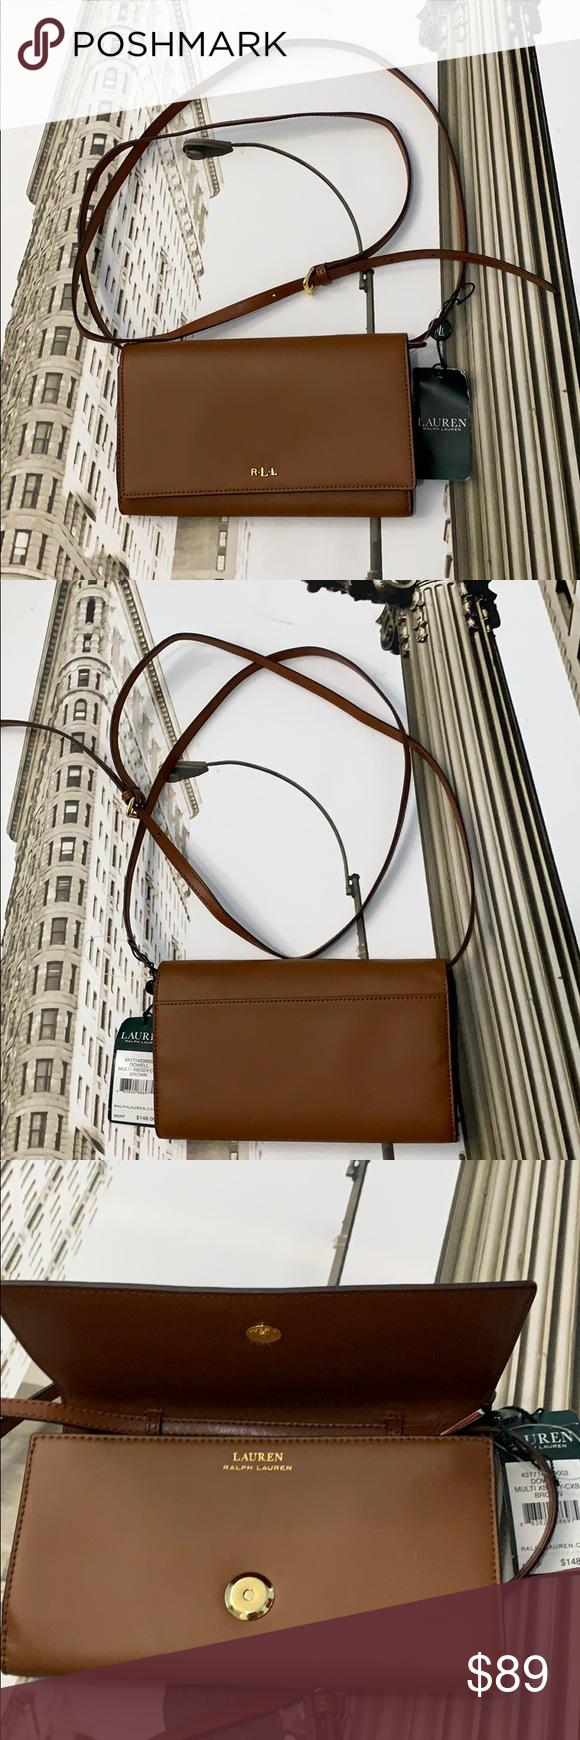 9c2ffc392d LAUREN RALPH LAUREN DOWELL Leather Crossbody Bag Leather Foldover flap with  snap closure Removable shoulder strap